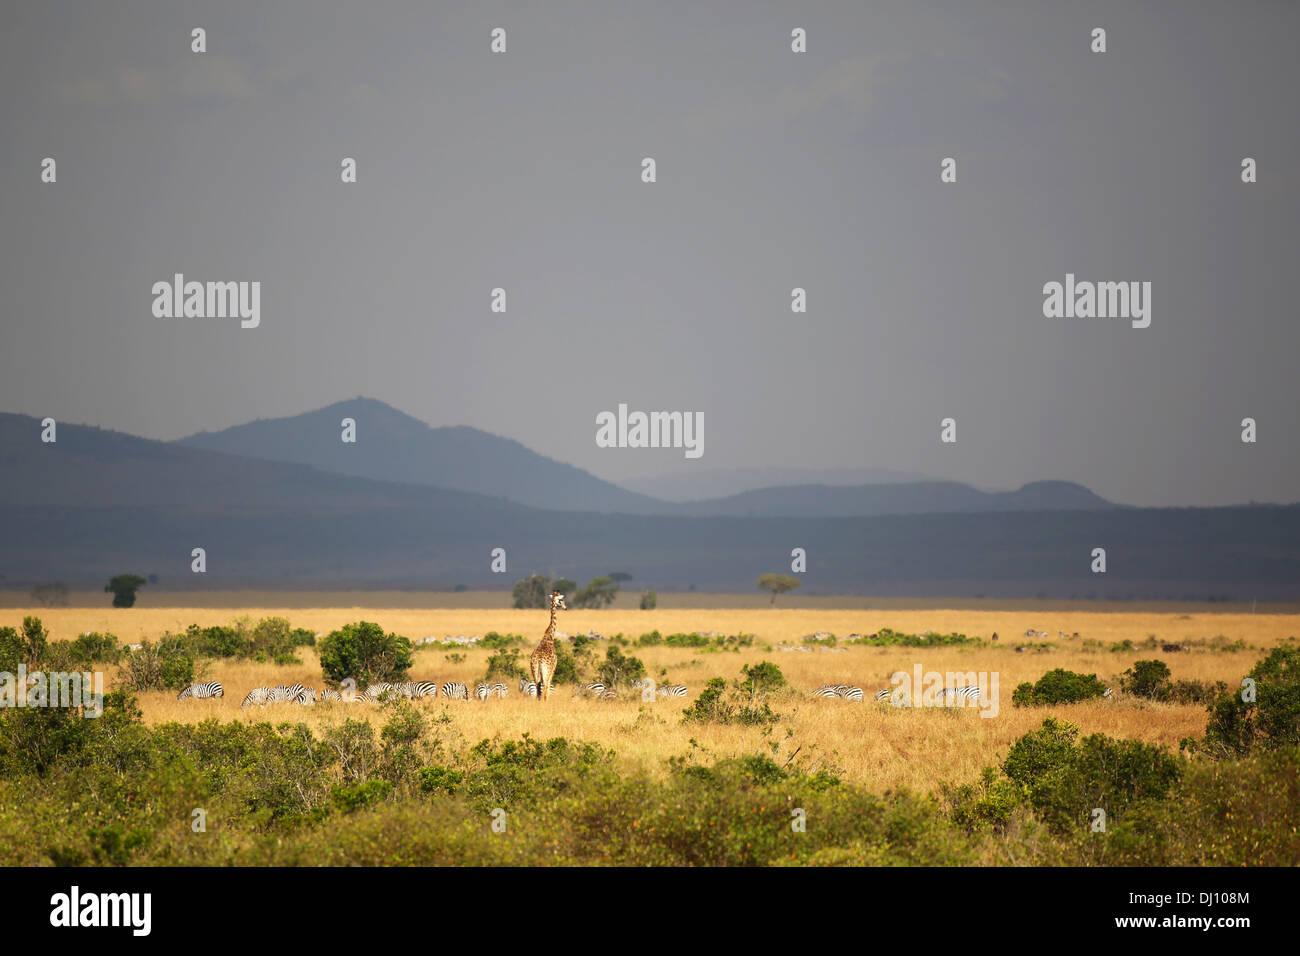 Zebras and a giraffe at sunset in the Maasai Mara plains. - Stock Image